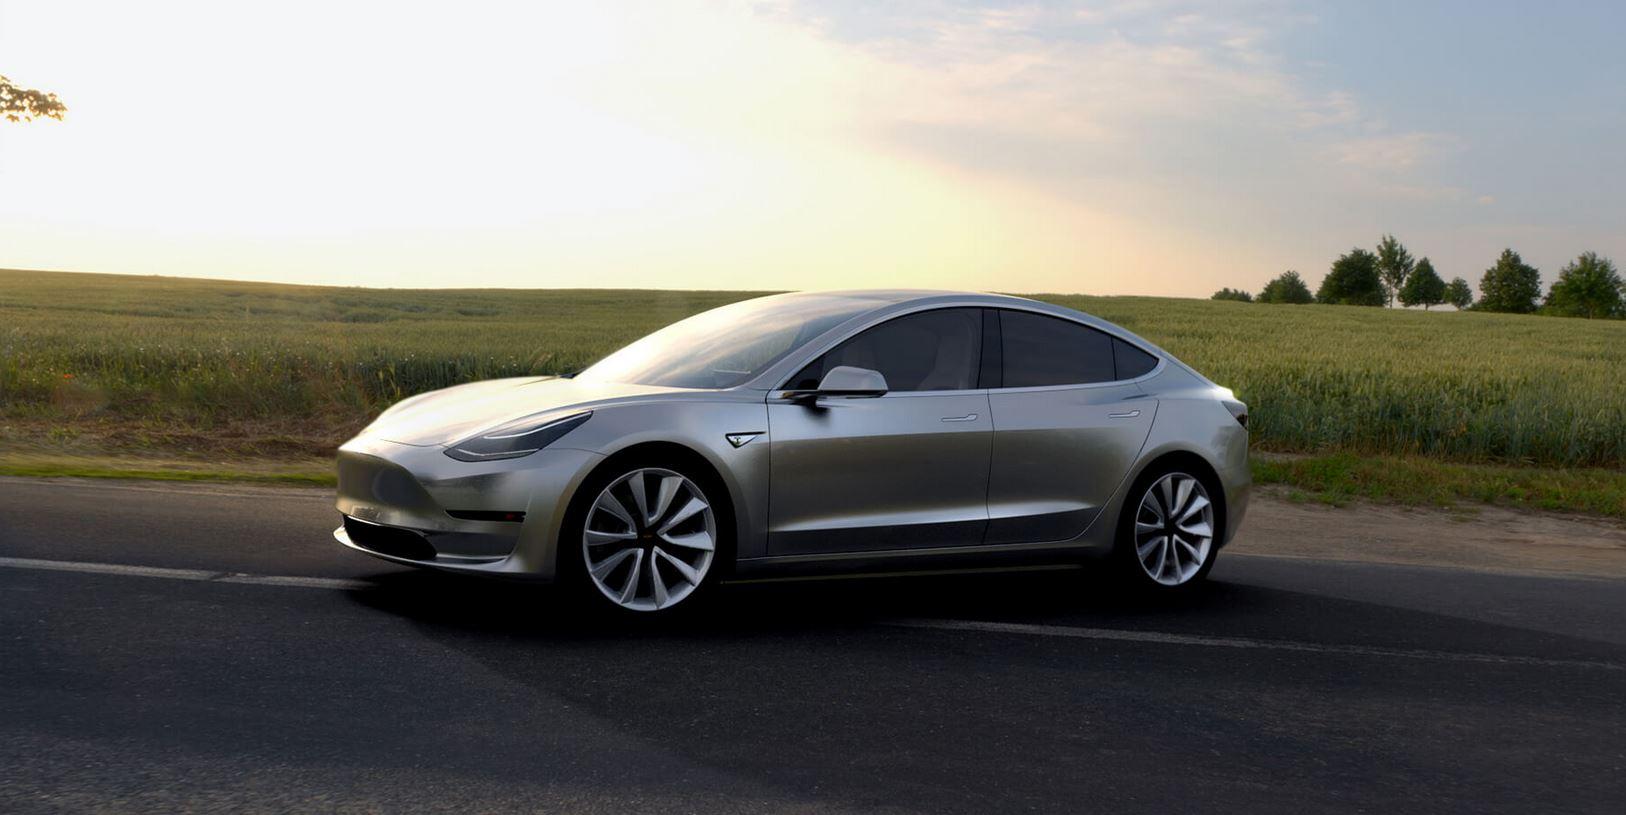 Tesla - Pimping Elon's Ride? - Future - The Property Pin